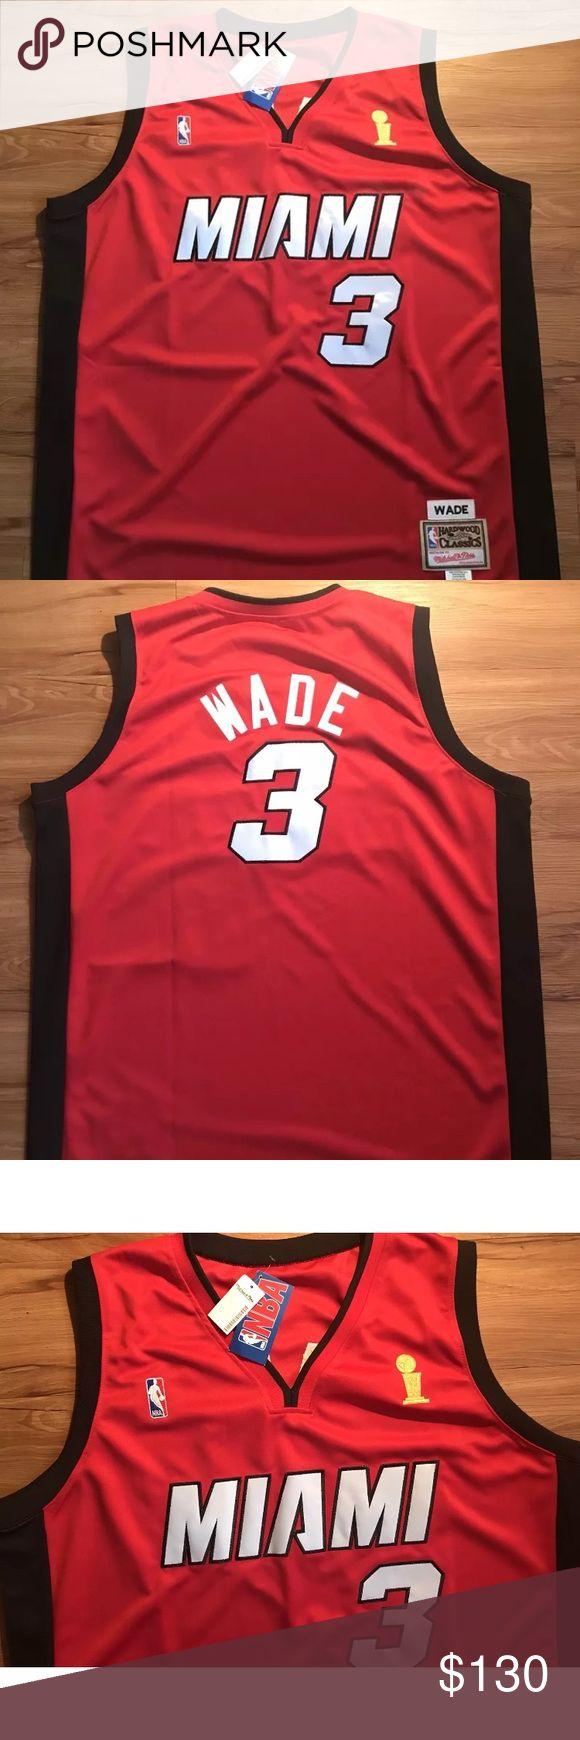 NWT Mitchell & Ness Miami Heat Wade jersey Sz 56 New with tags, NBA finals Mitchell & Ness Jersey. Mitchell & Ness Other